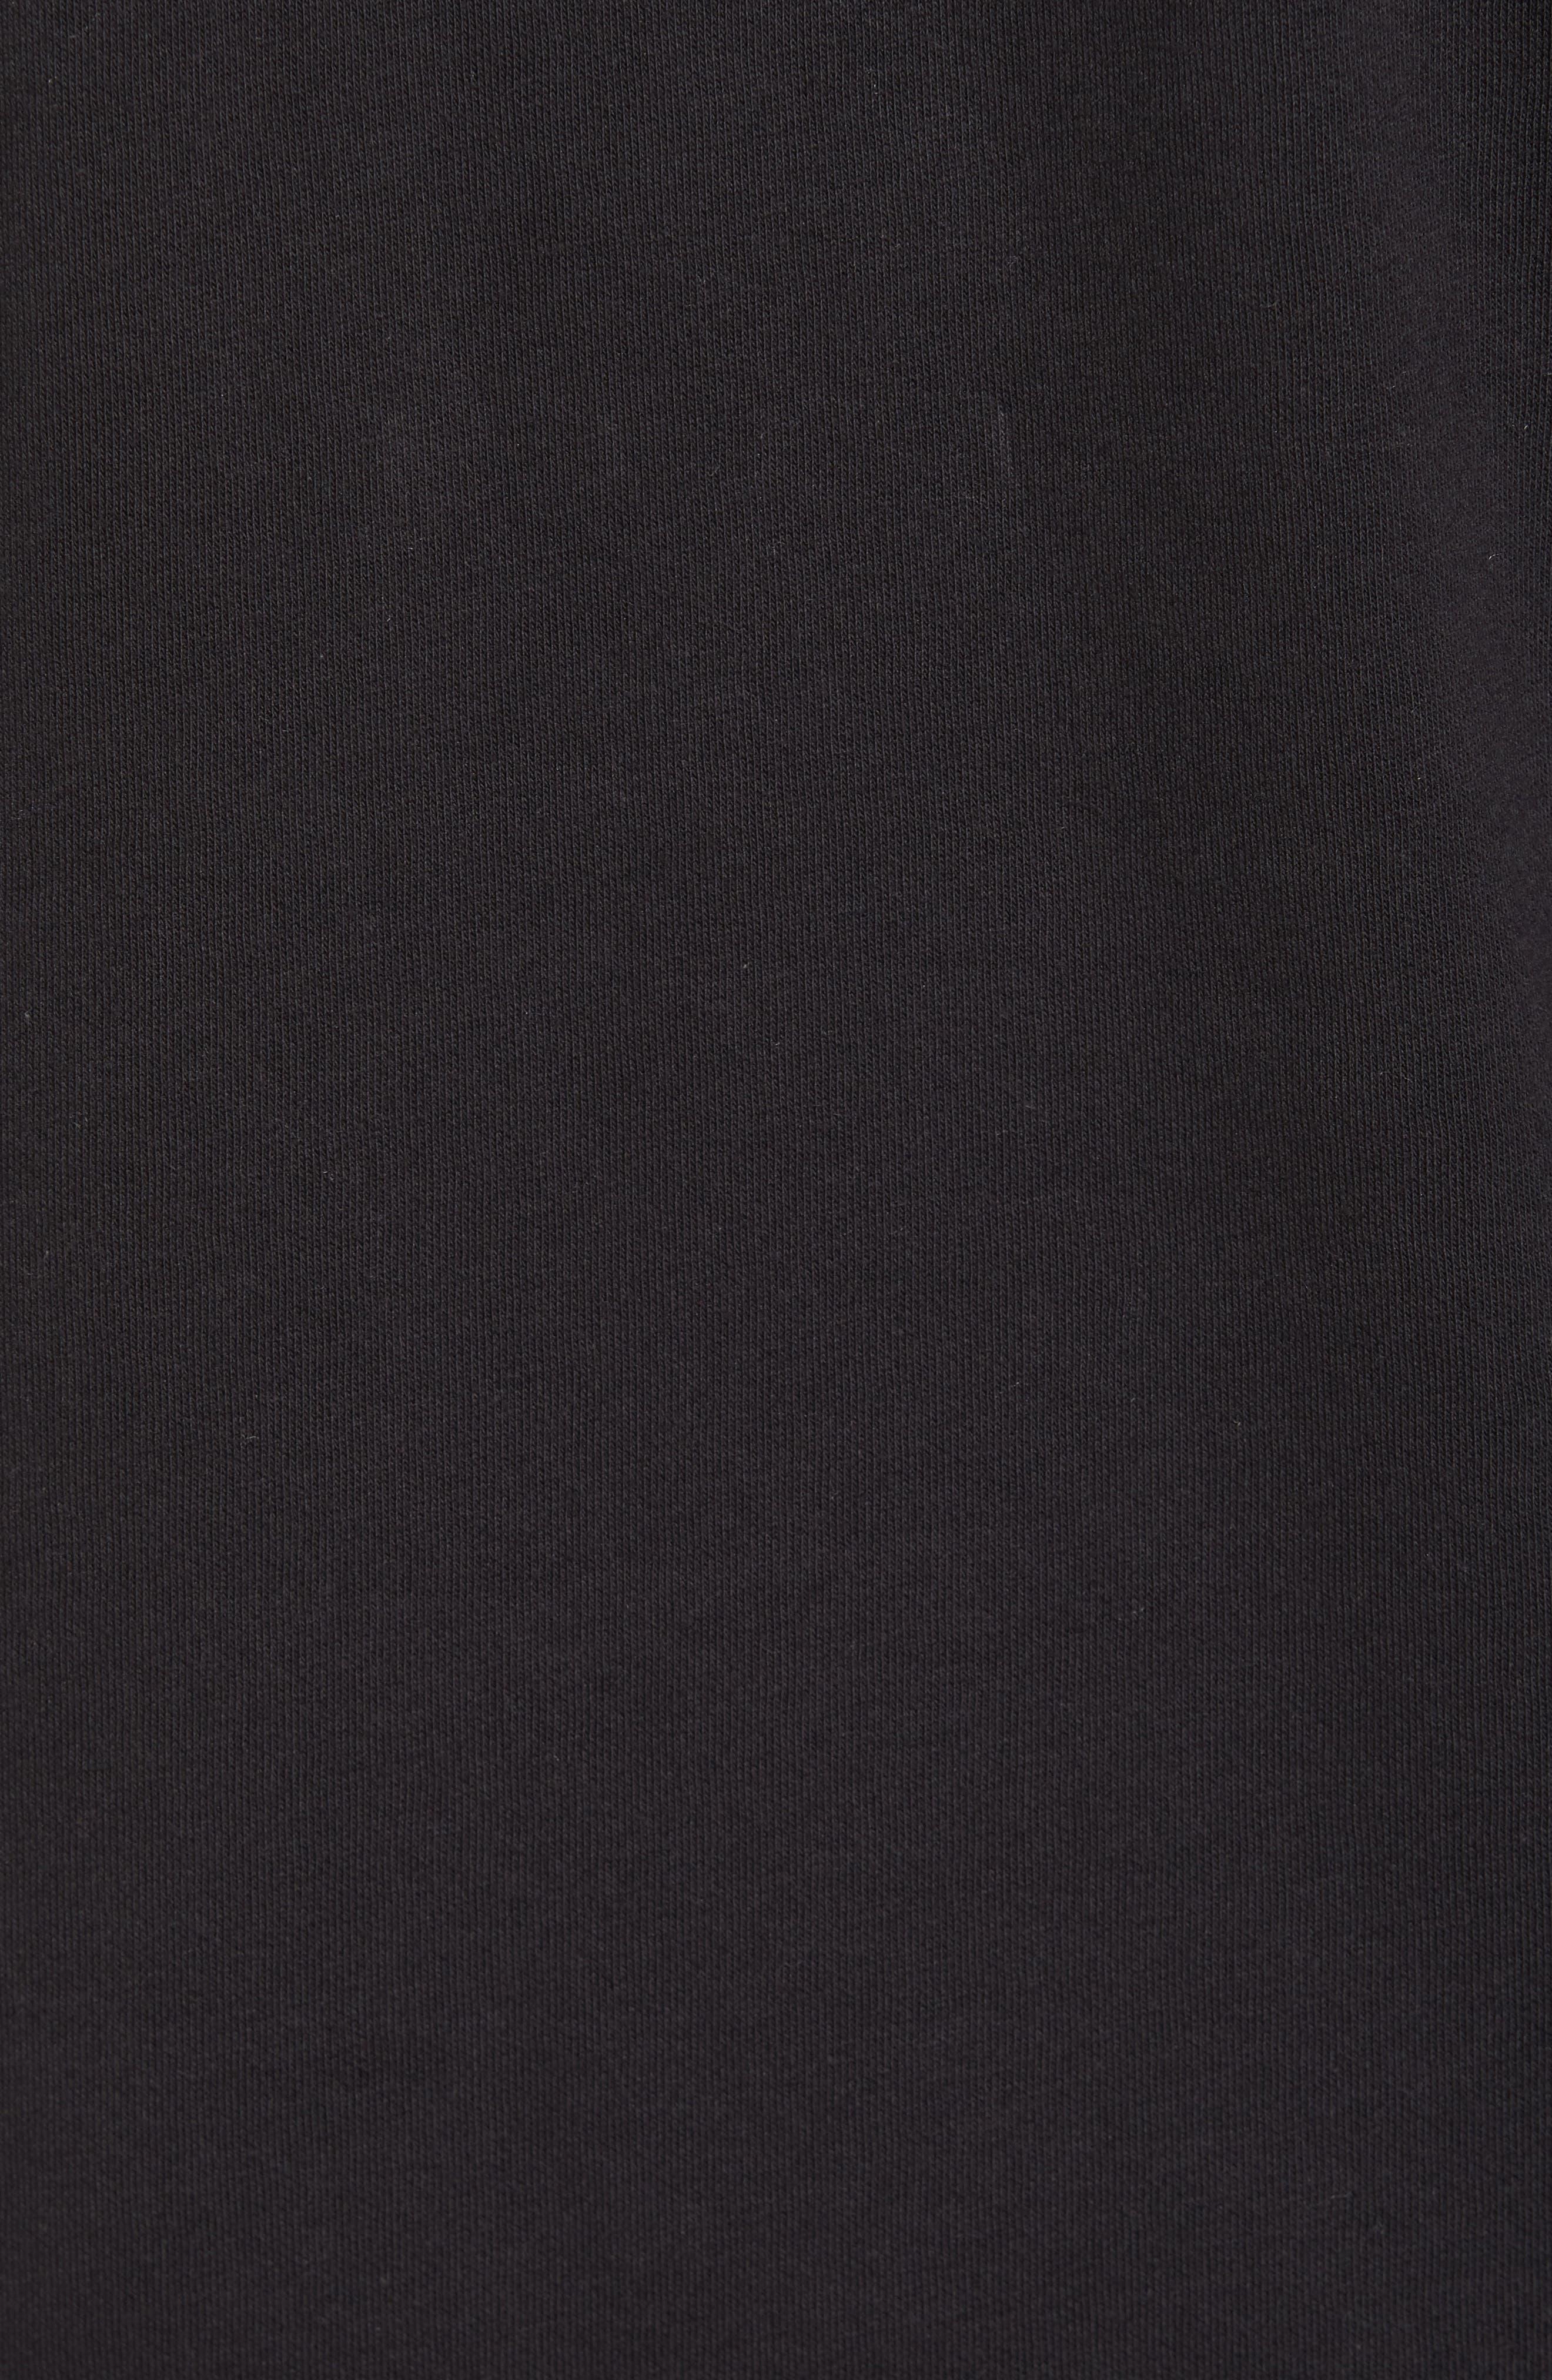 'Half Dome' Crewneck Sweatshirt,                             Alternate thumbnail 5, color,                             002